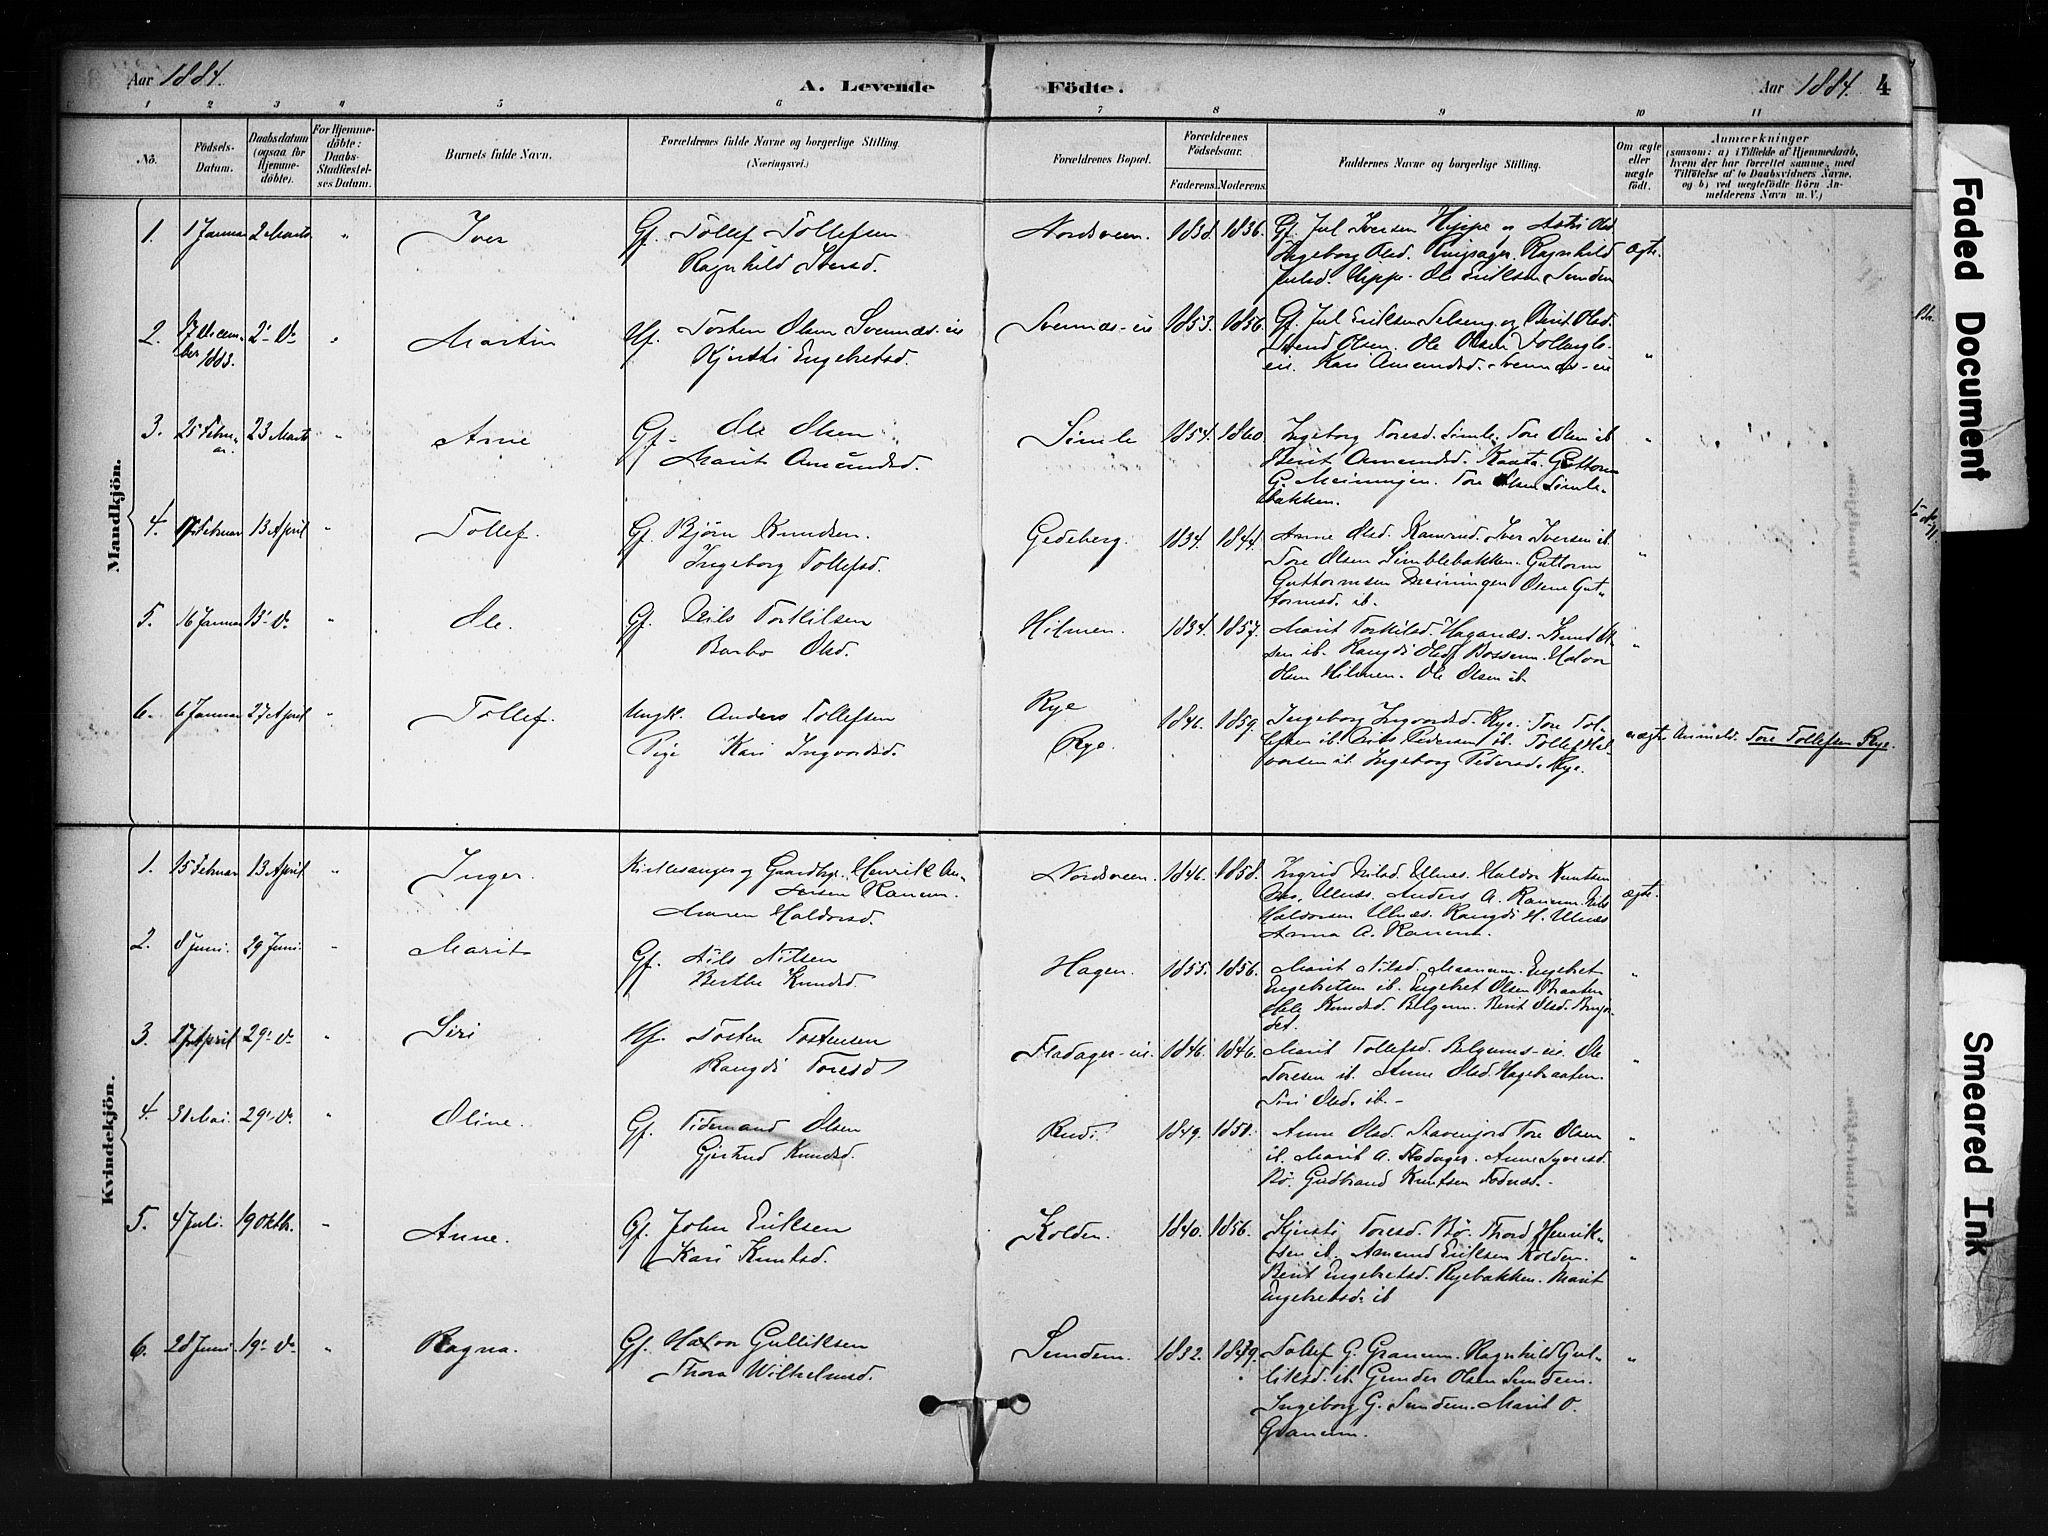 SAH, Nord-Aurdal prestekontor, Ministerialbok nr. 11, 1883-1896, s. 4